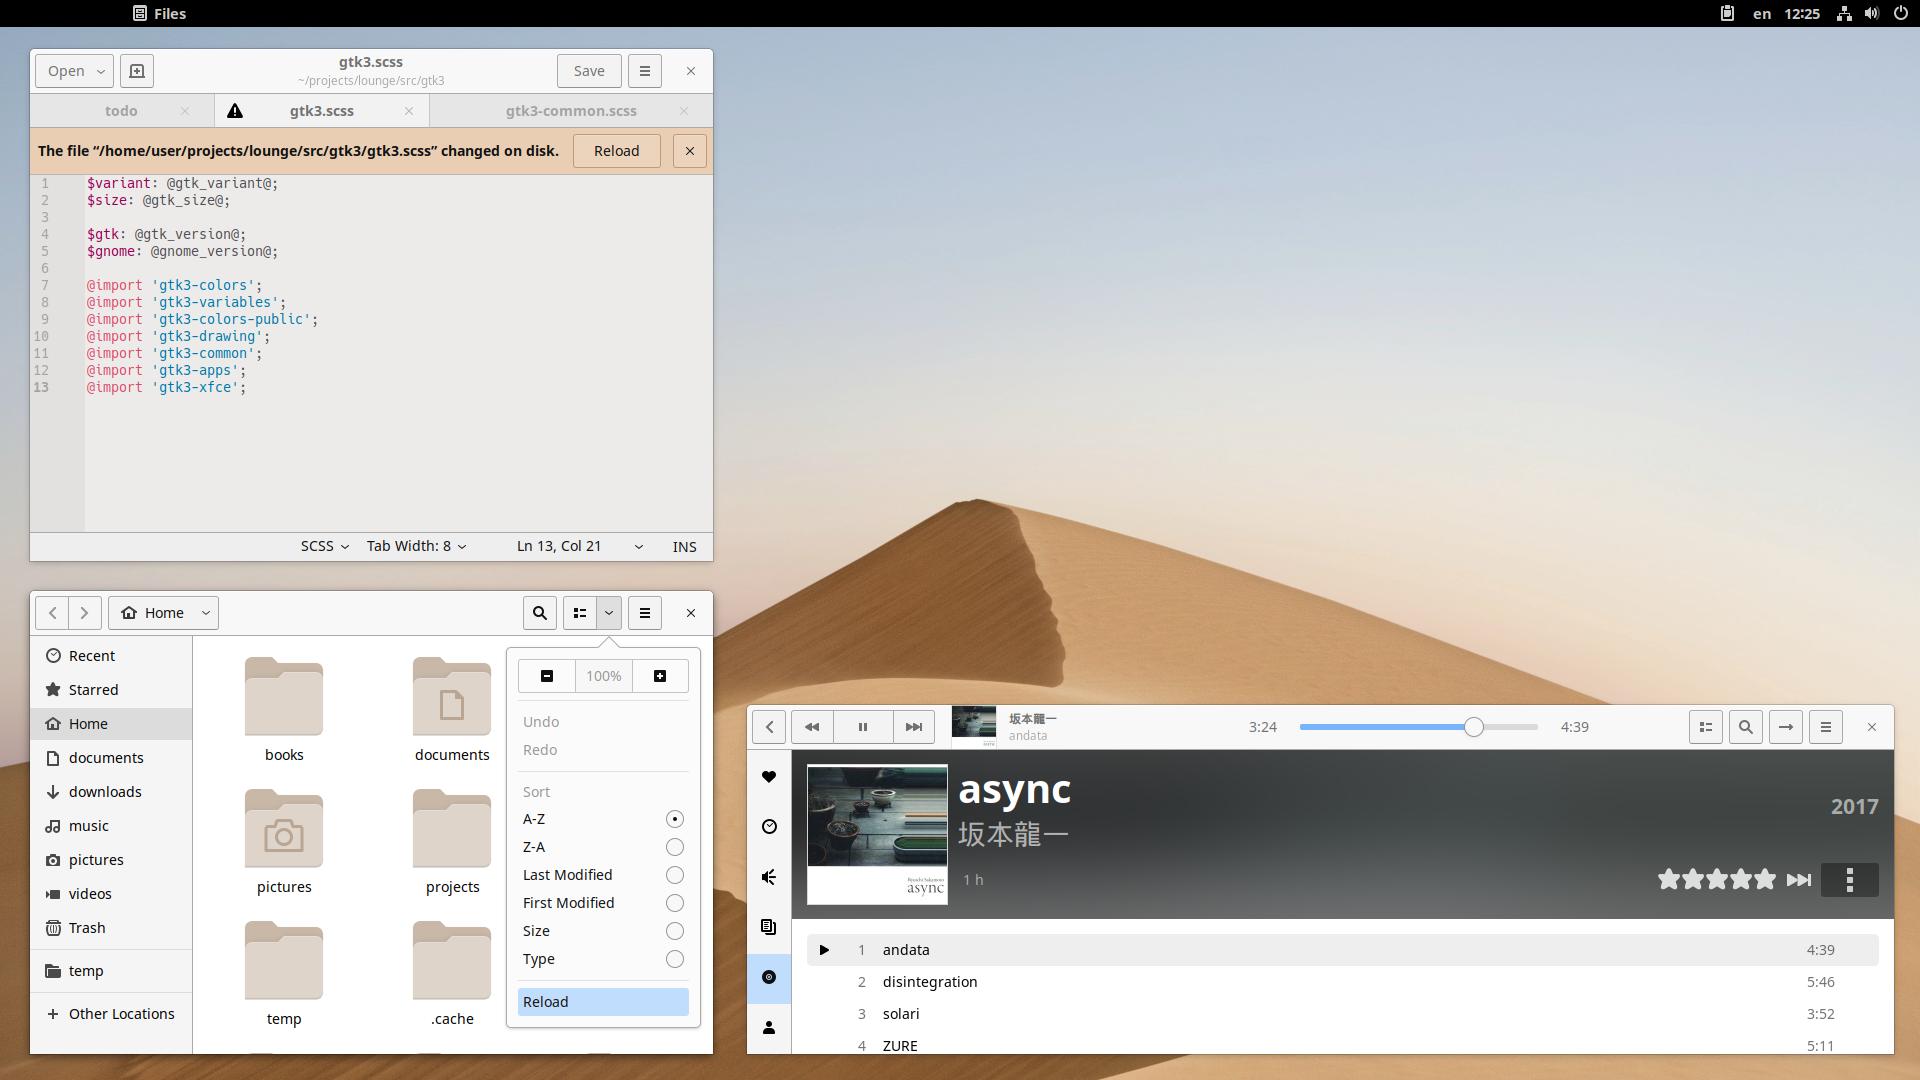 Rtl8723de Arch Linux